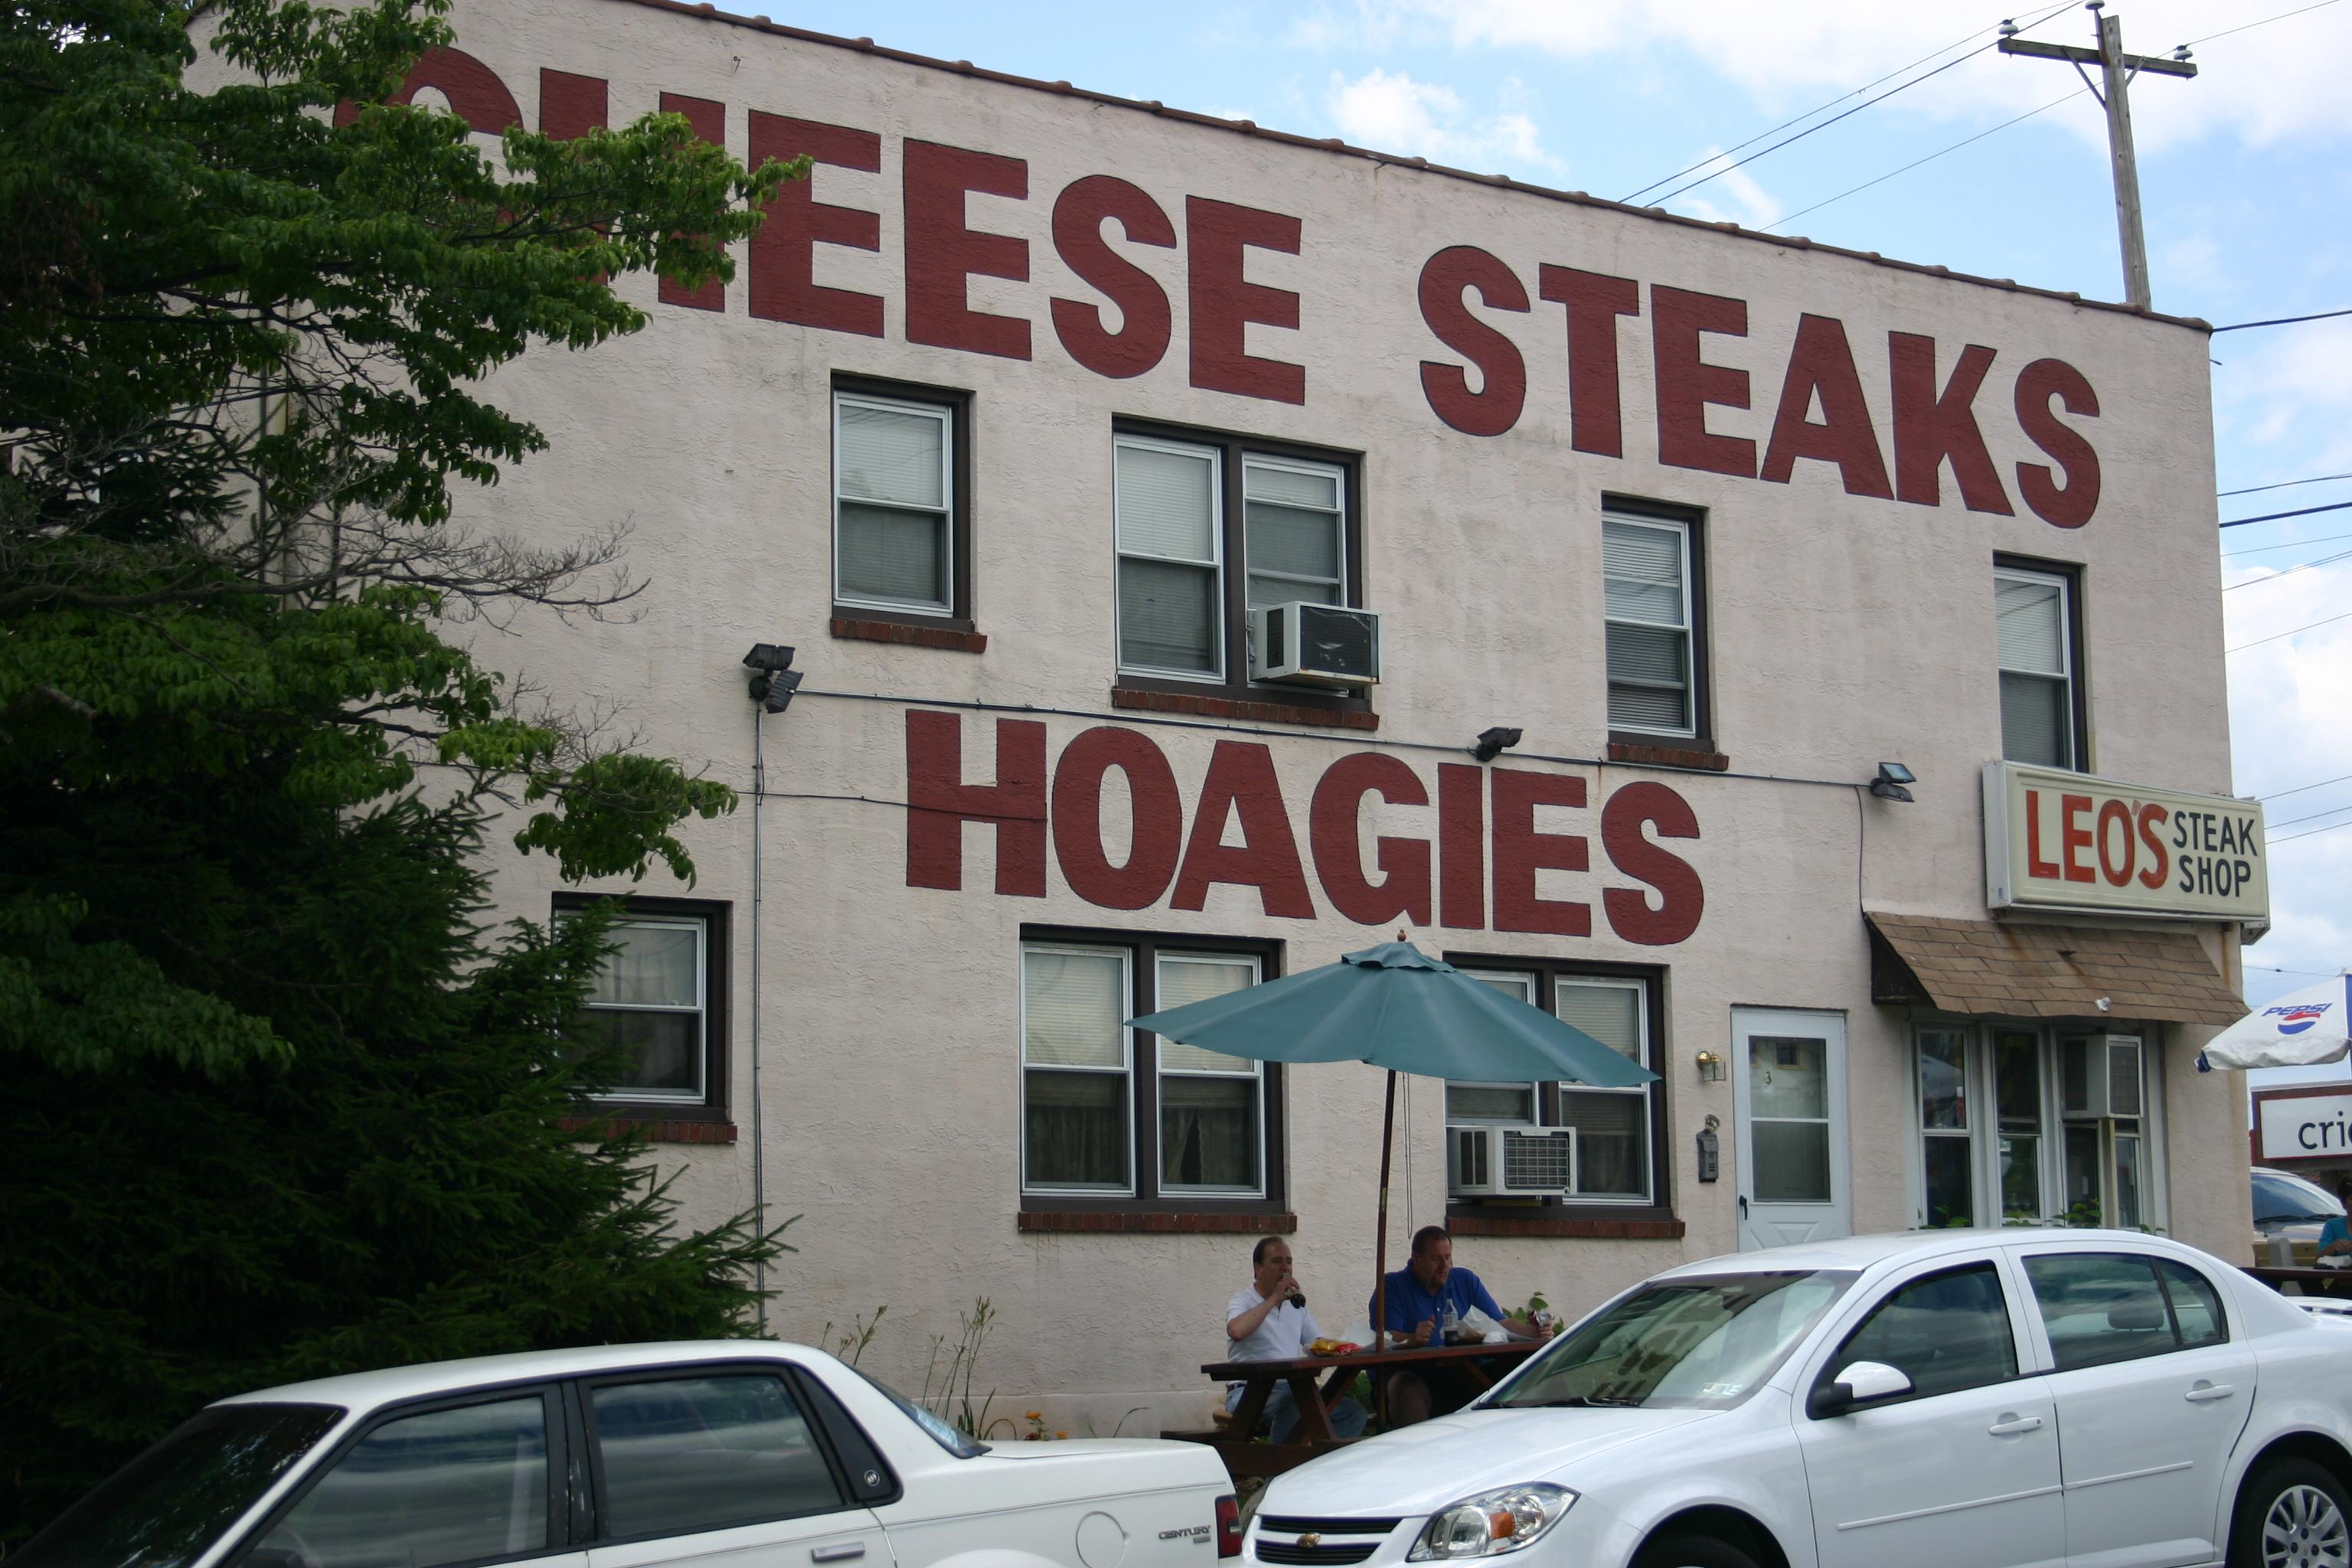 Var finns den bästa Cheesesteaken?